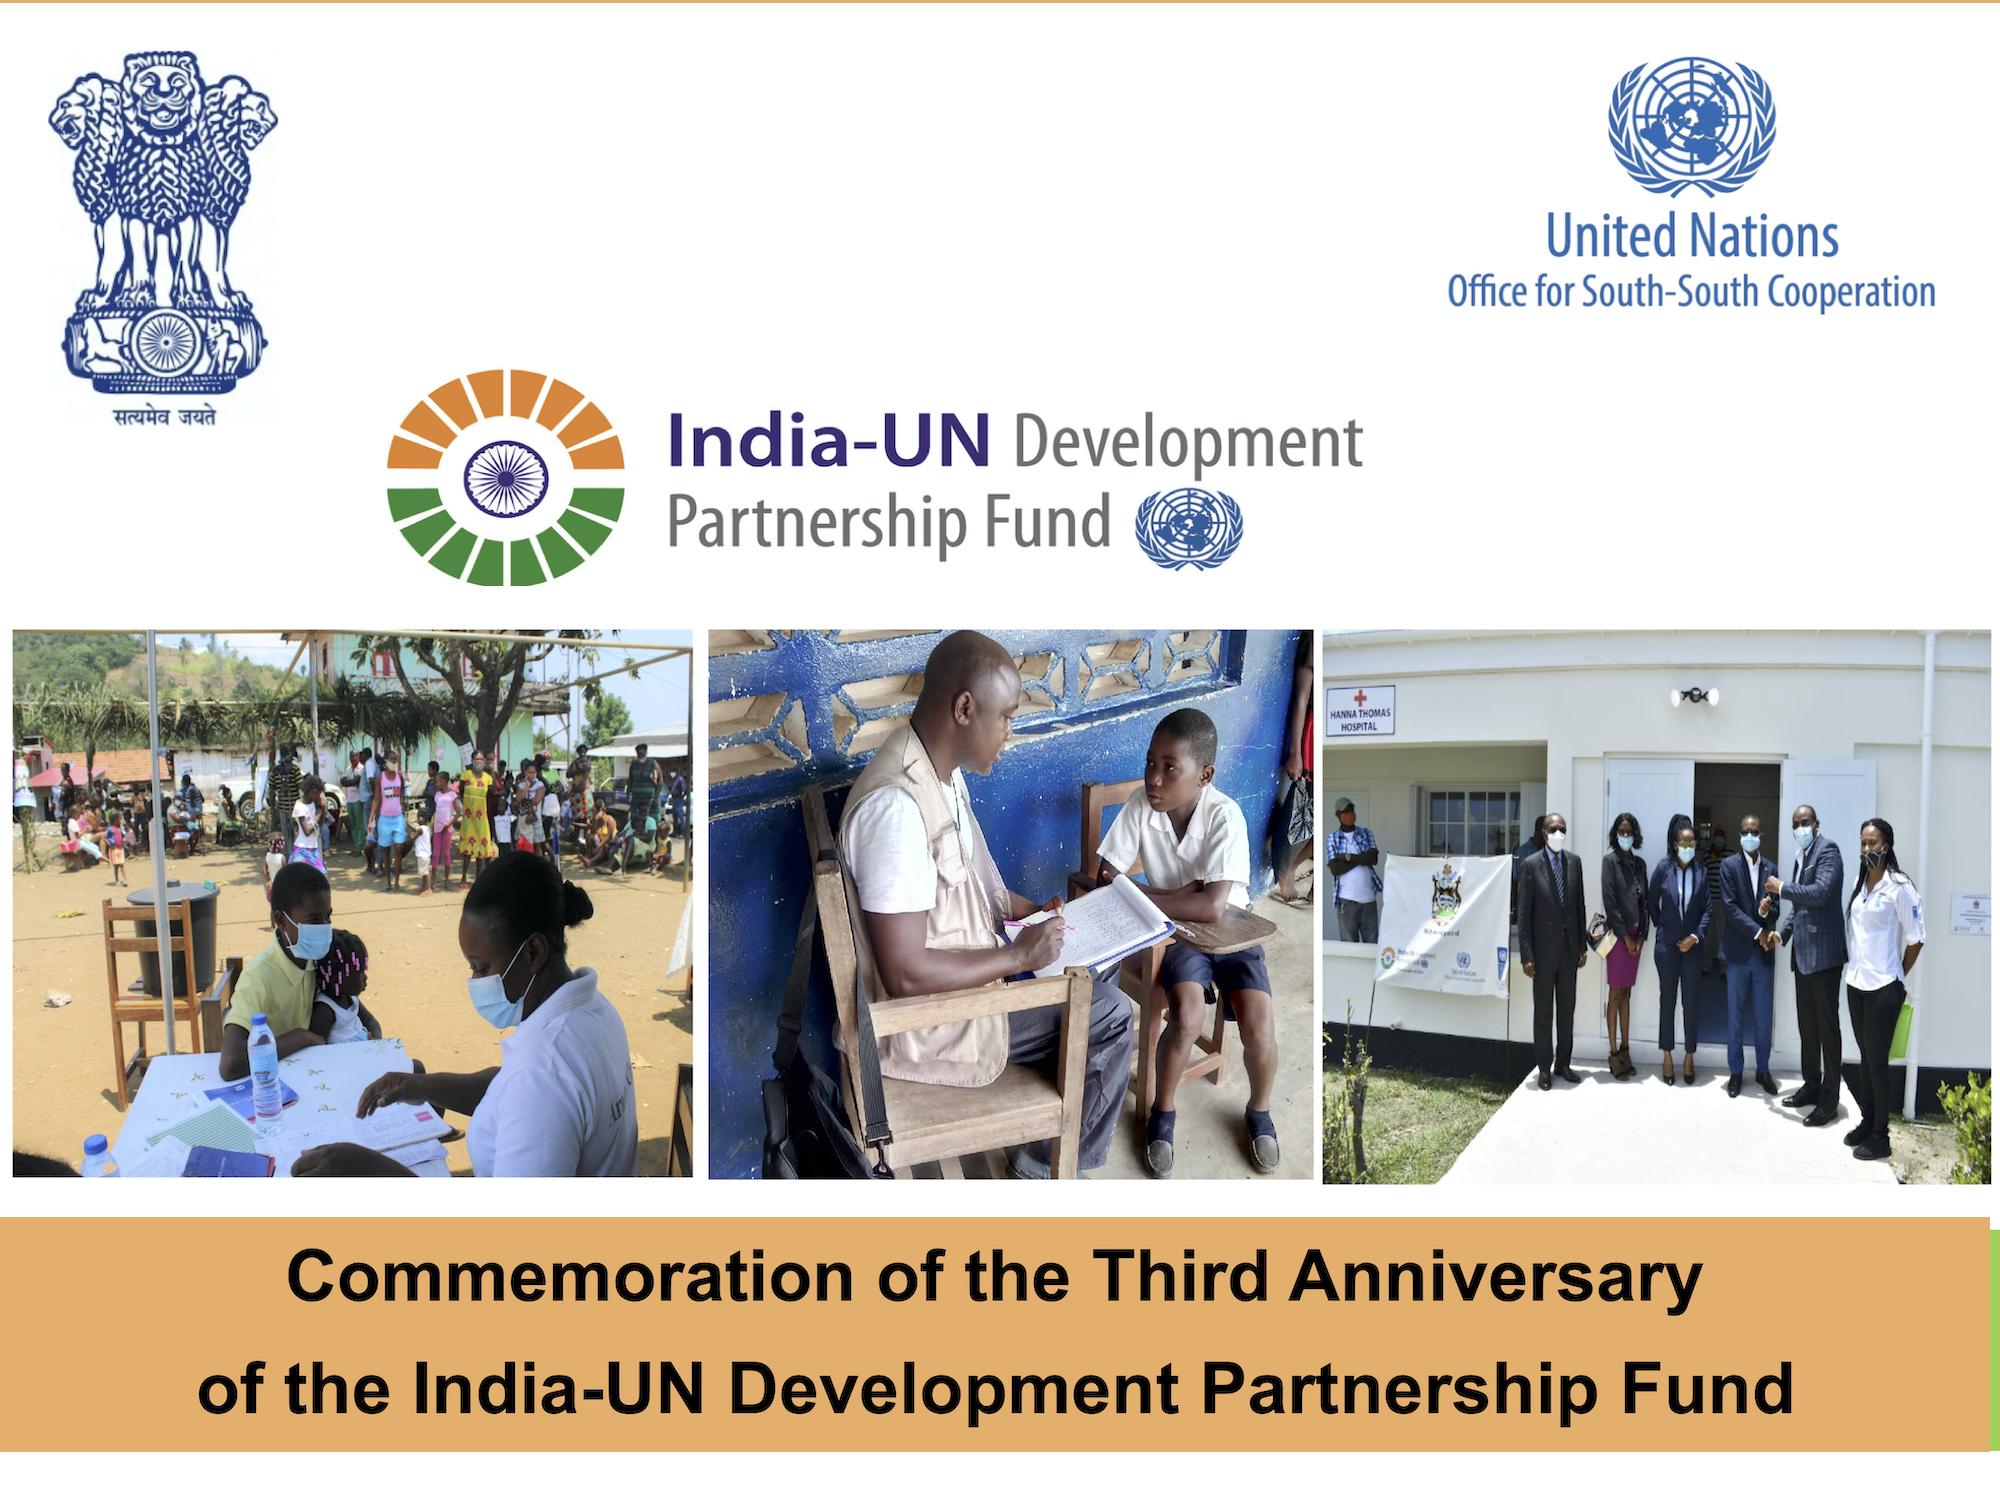 India-UN Development Partnership Fund Commemoration of Third Anniversary